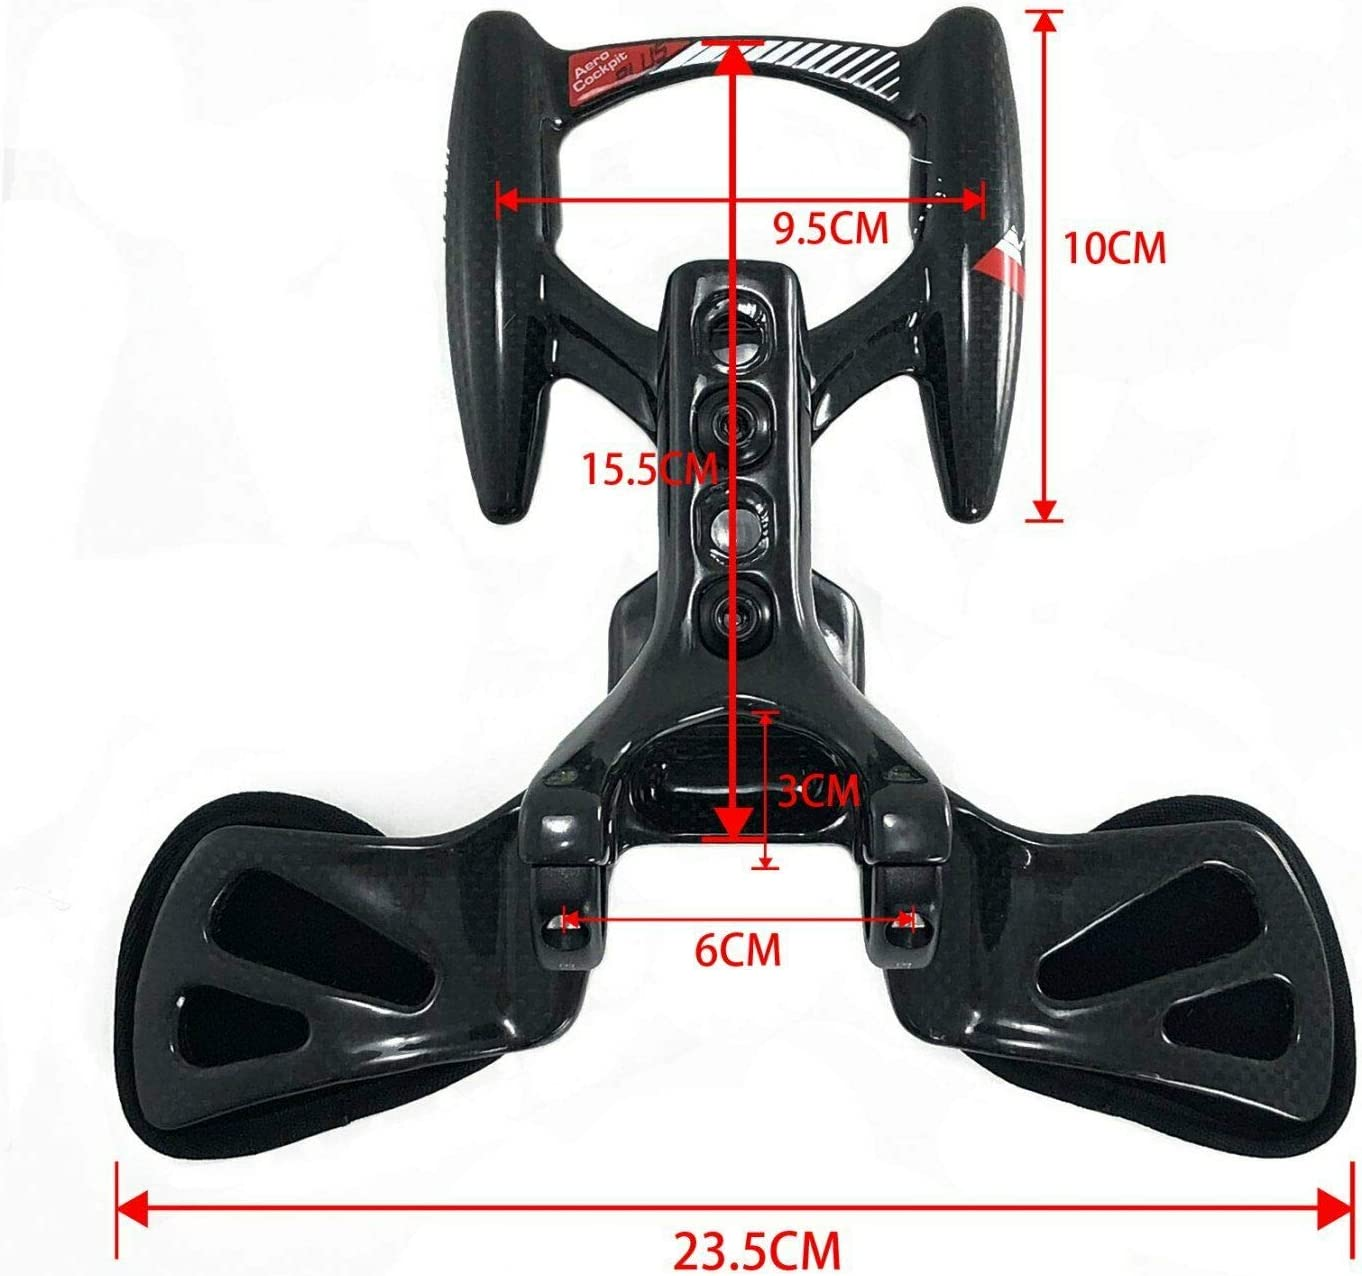 Controltech Triathlon Aero Cockpit Plus Carbon 31.8mm TT Arm Rest Handlebar